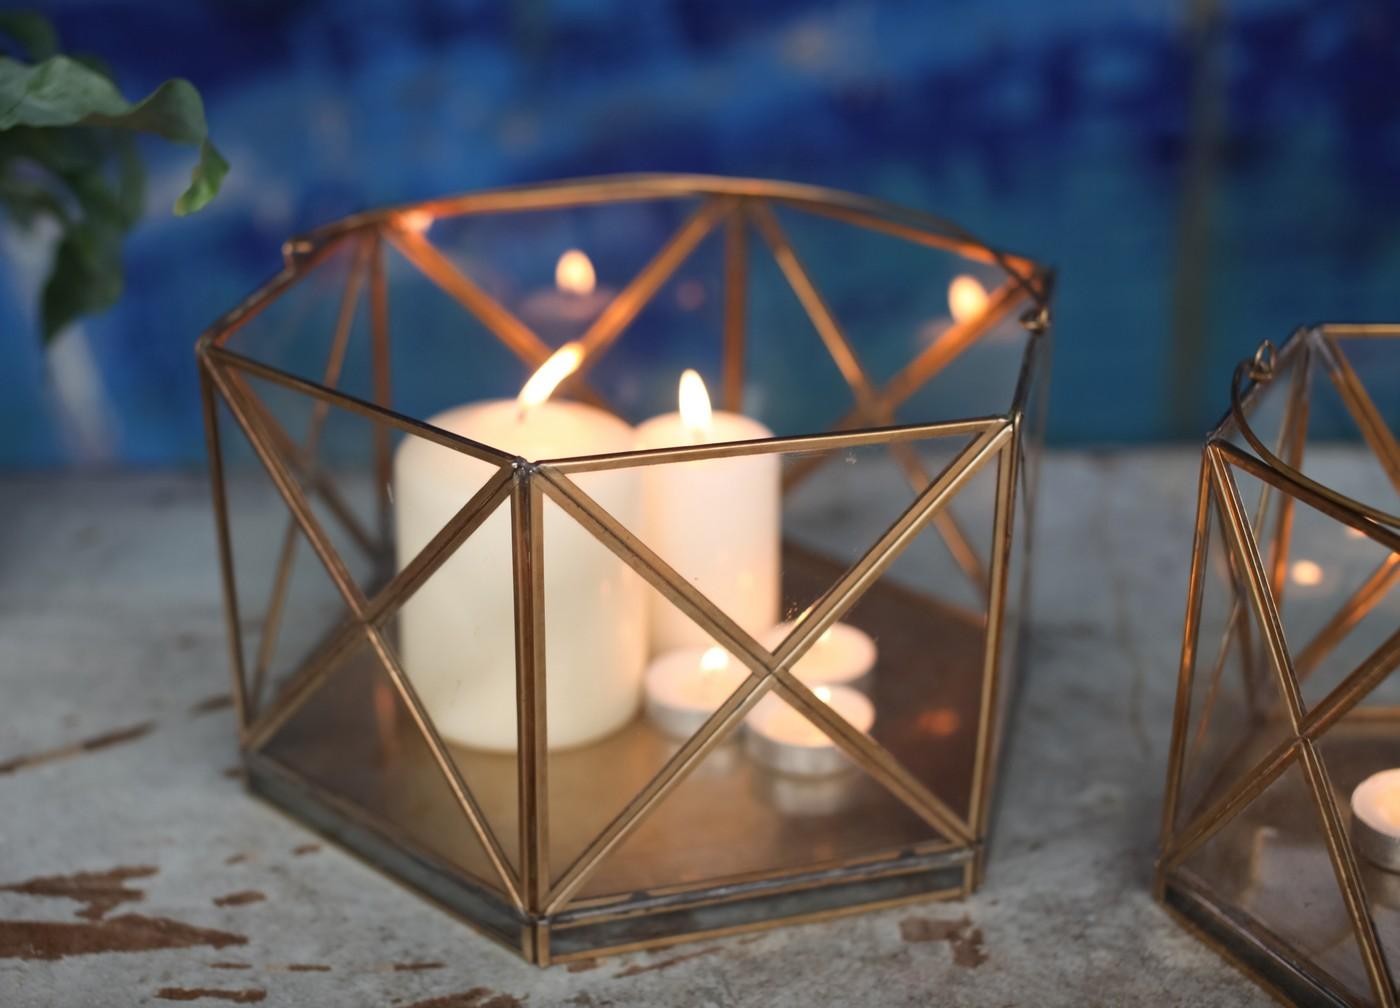 Small nema antique brass and glass lantern by nkuku Home decor lanterns